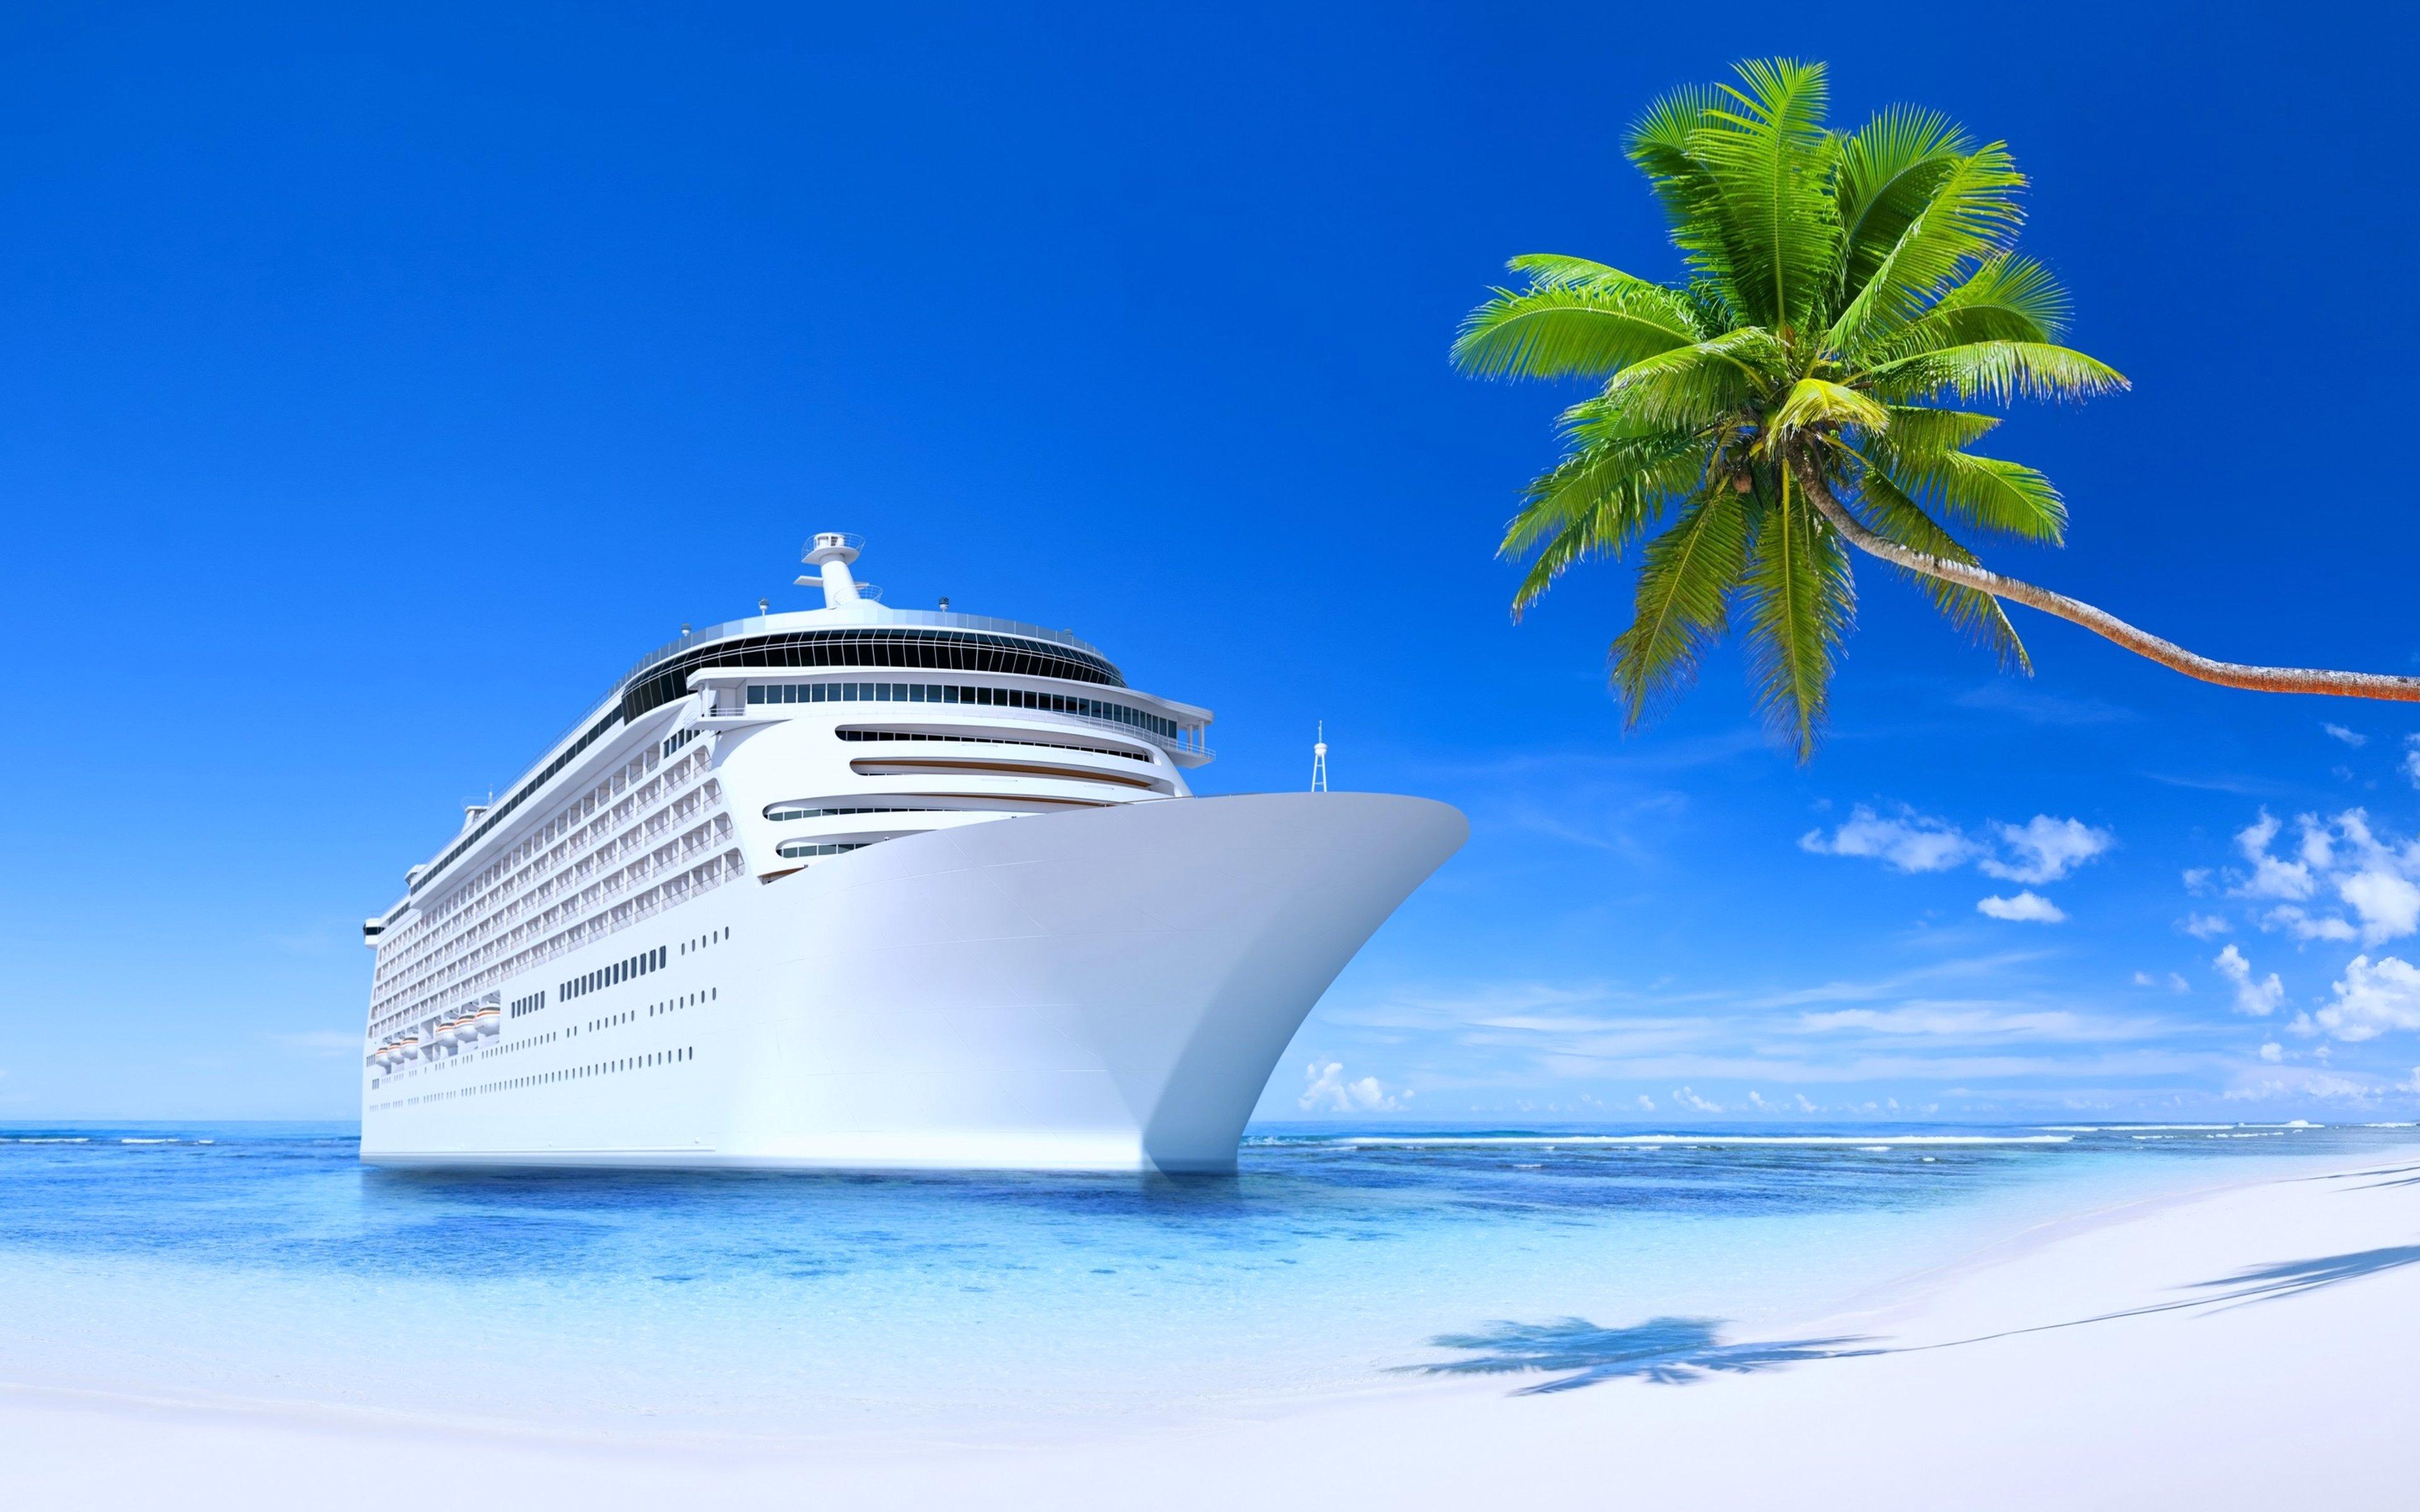 steamship ship tourism travel beach island sunny blue summer palms